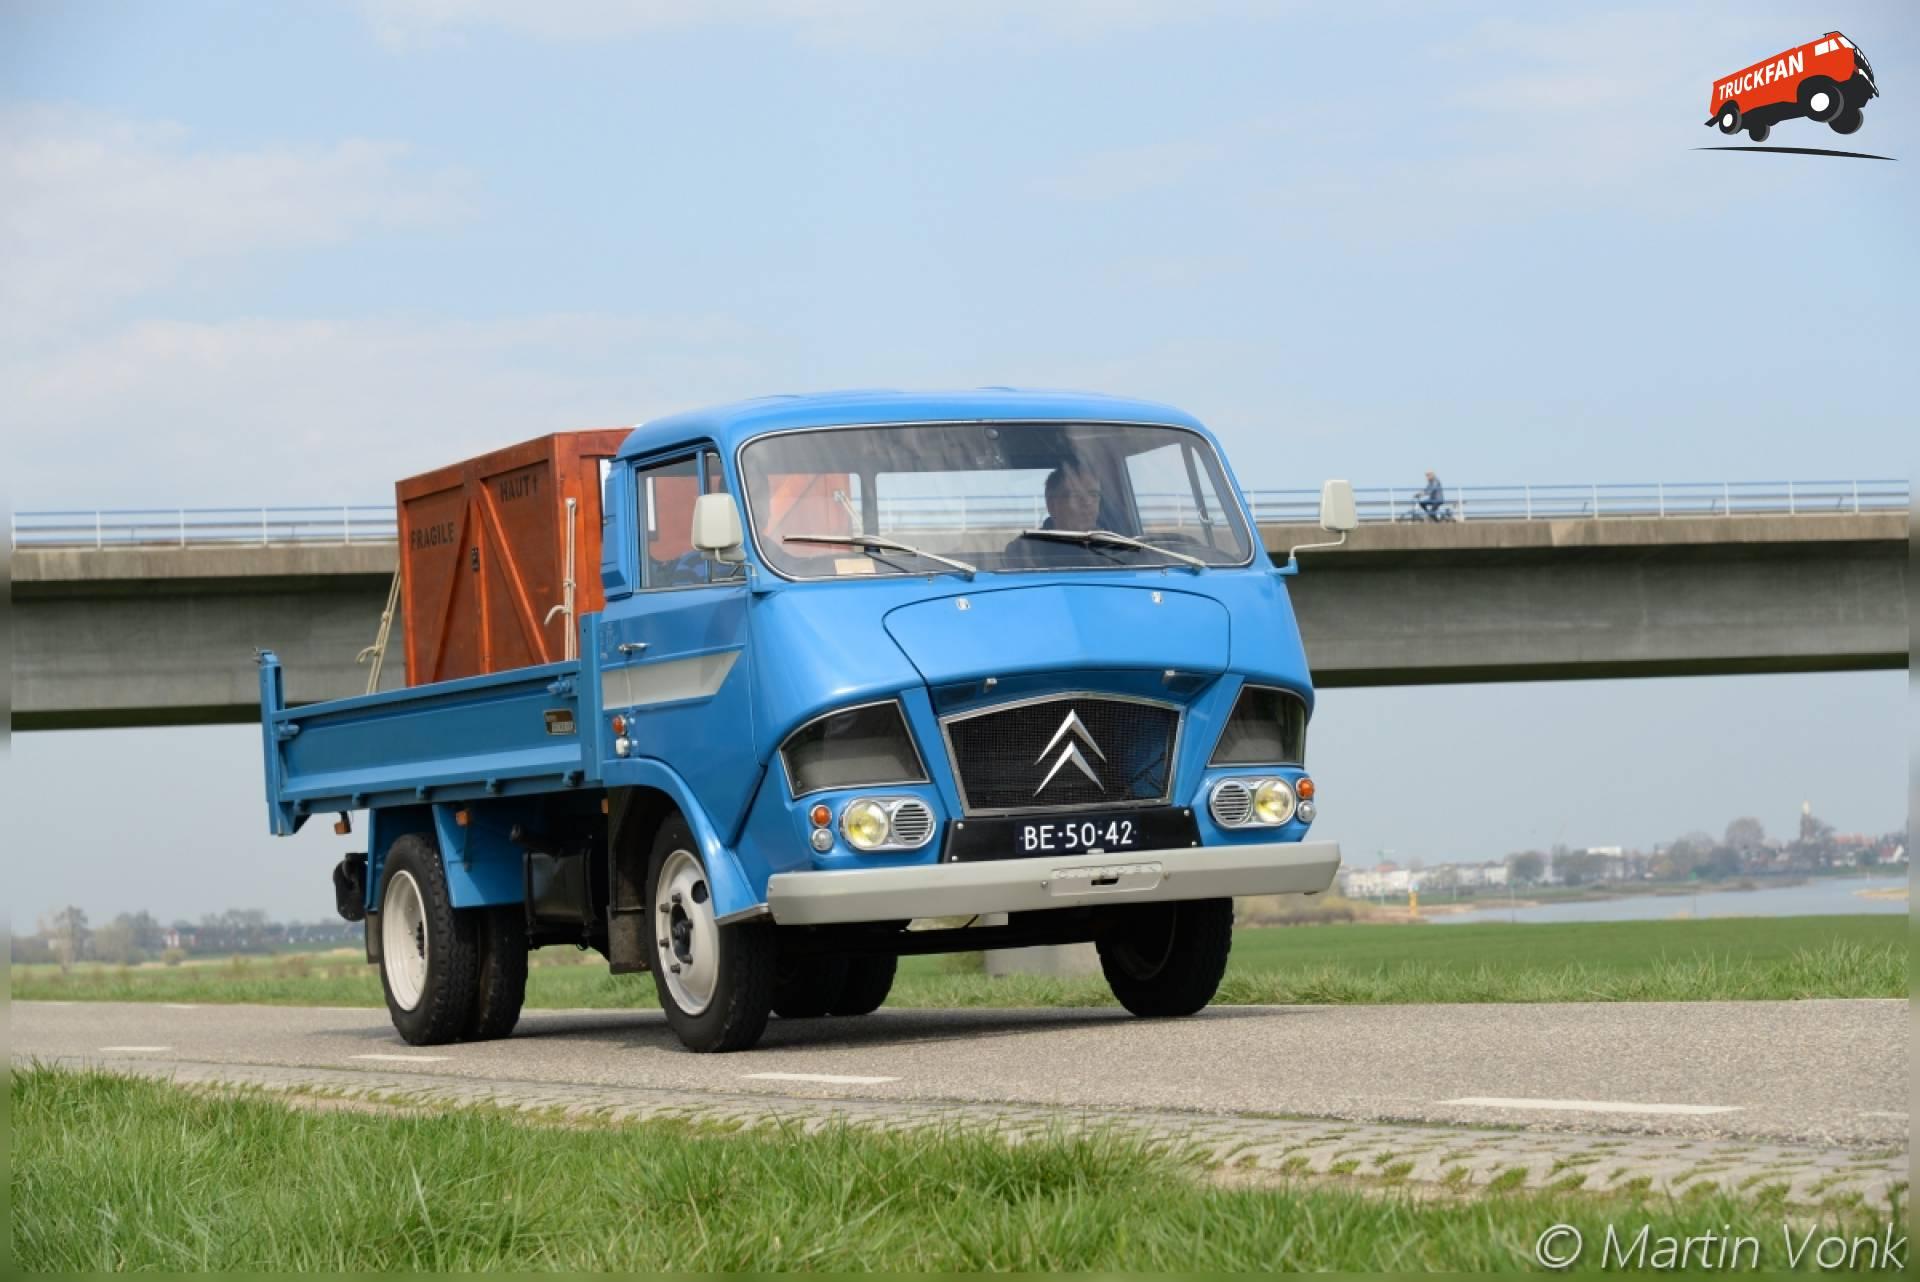 Citroën 350